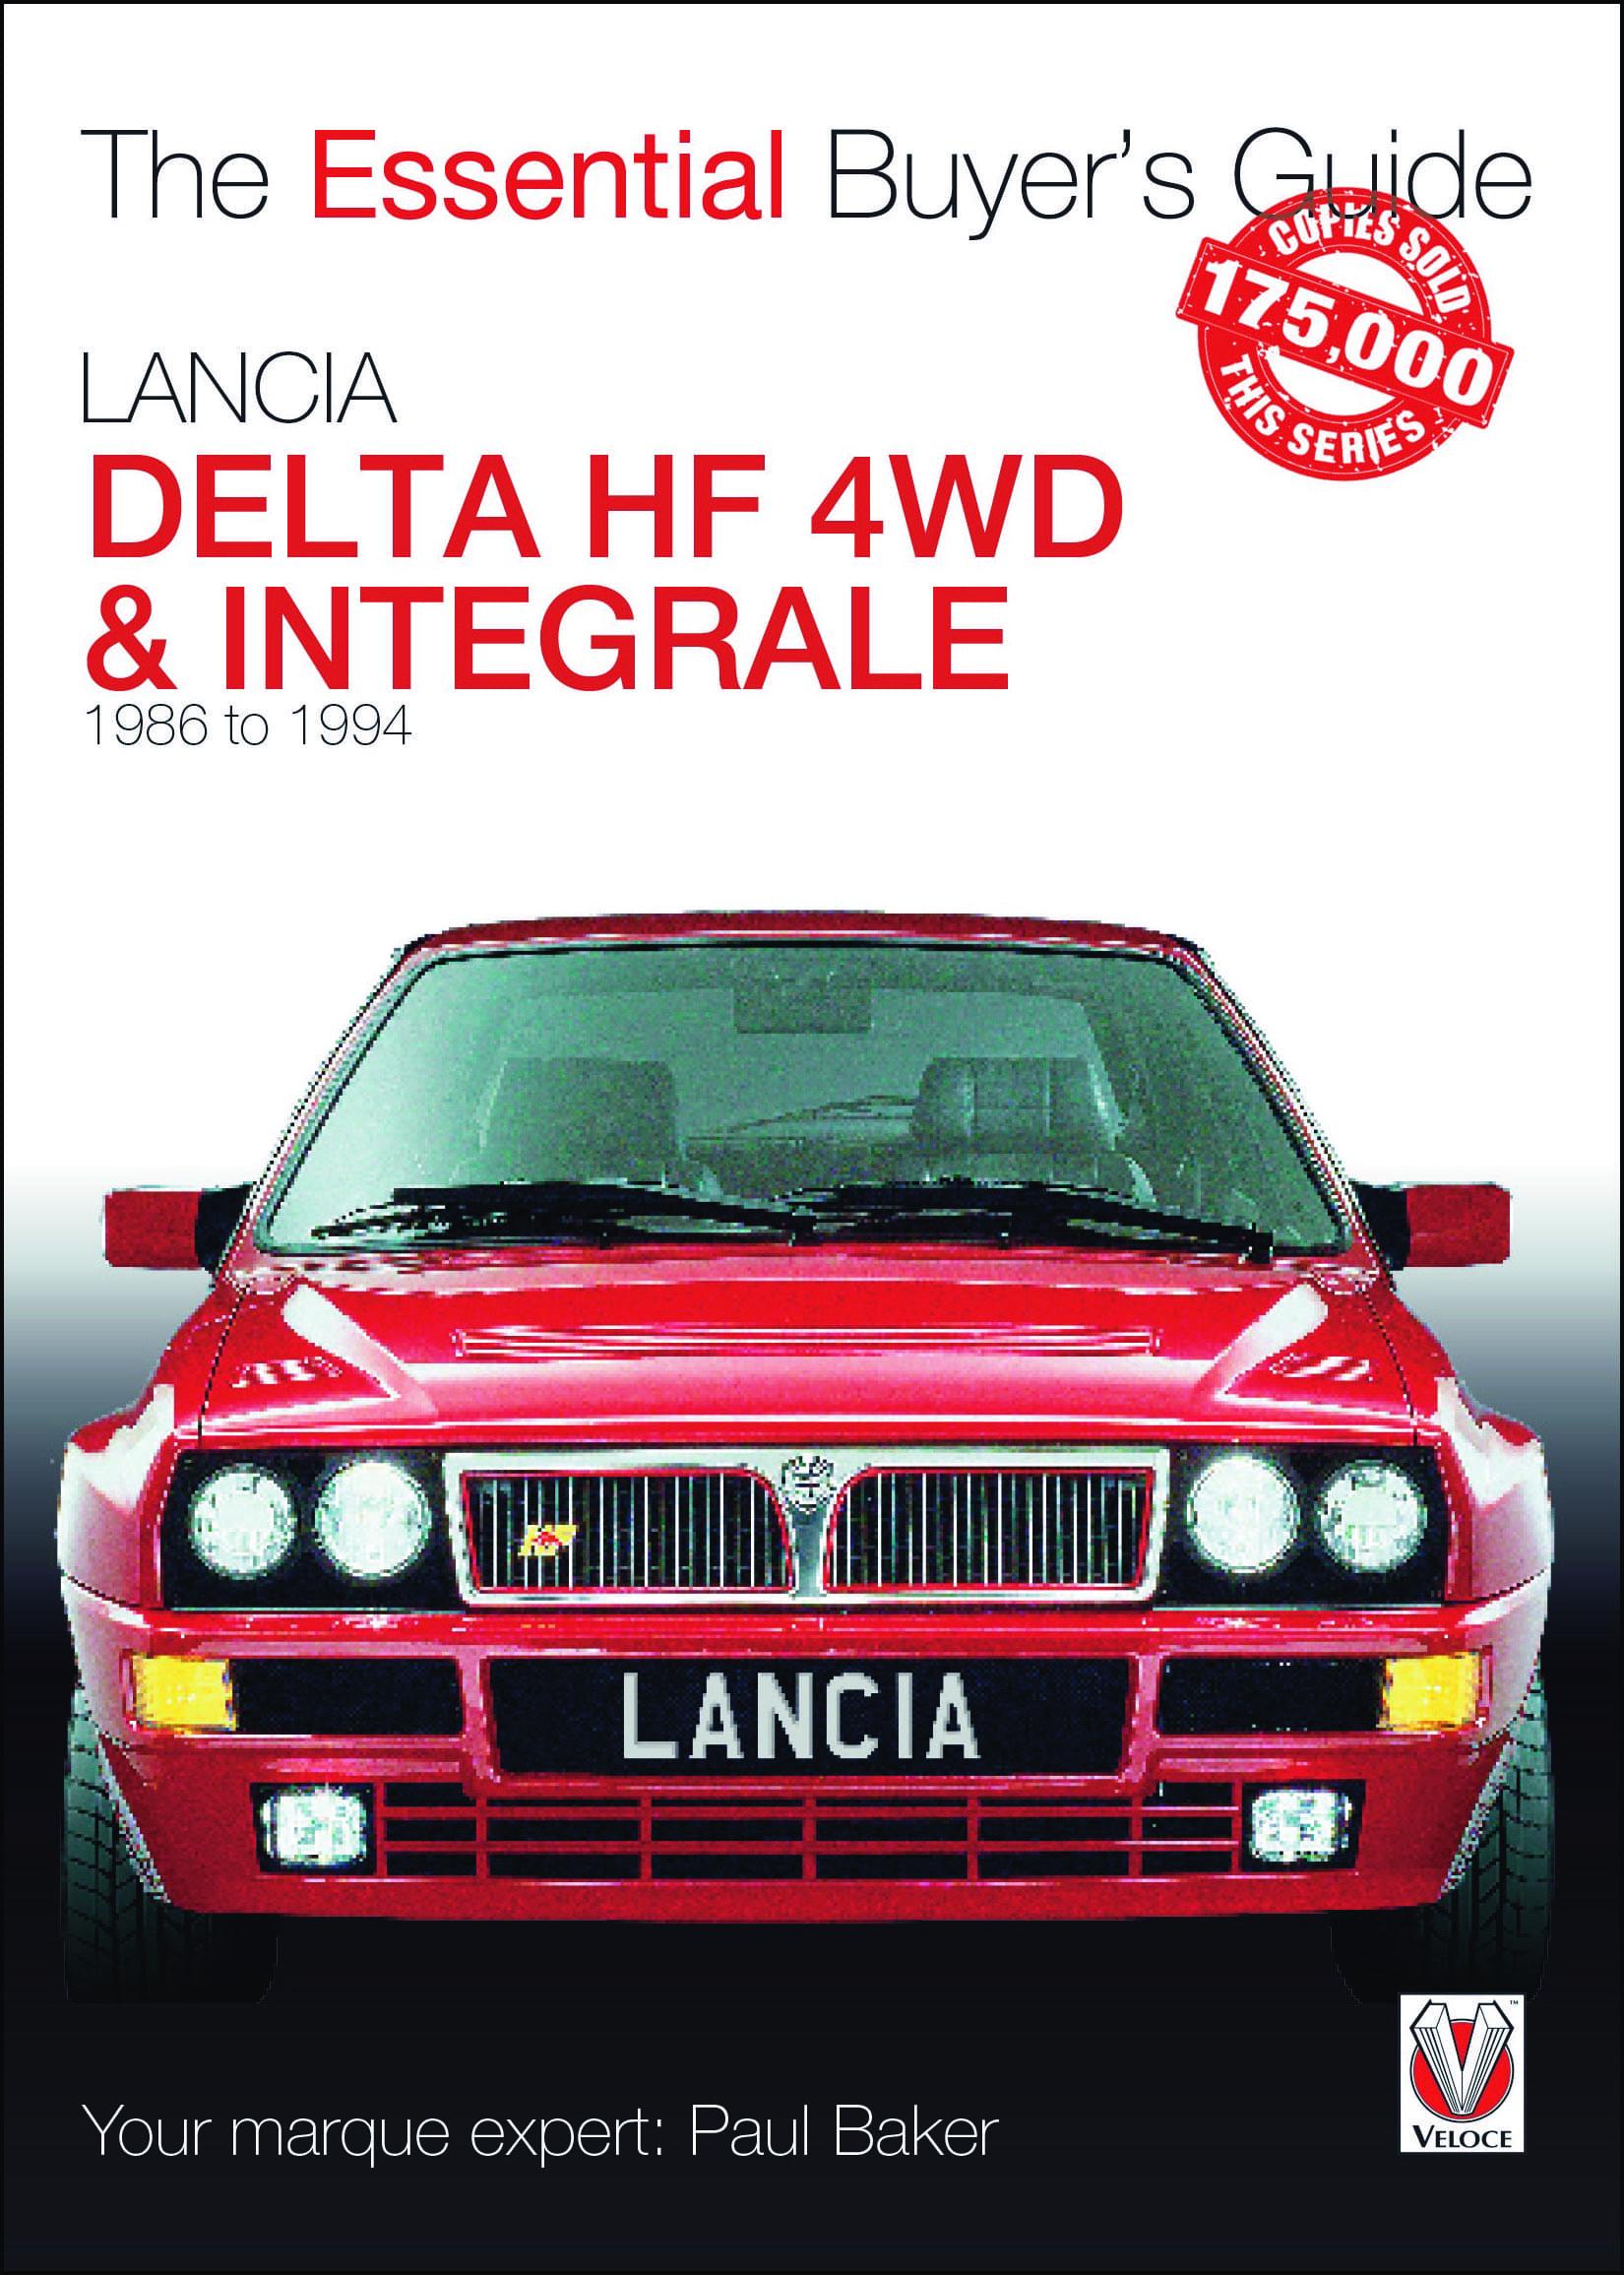 Lancia Delta HF 4WD & Integrale – 1986 to 1994 Essential Buyer's Guide – The Essential Buyer's Guide